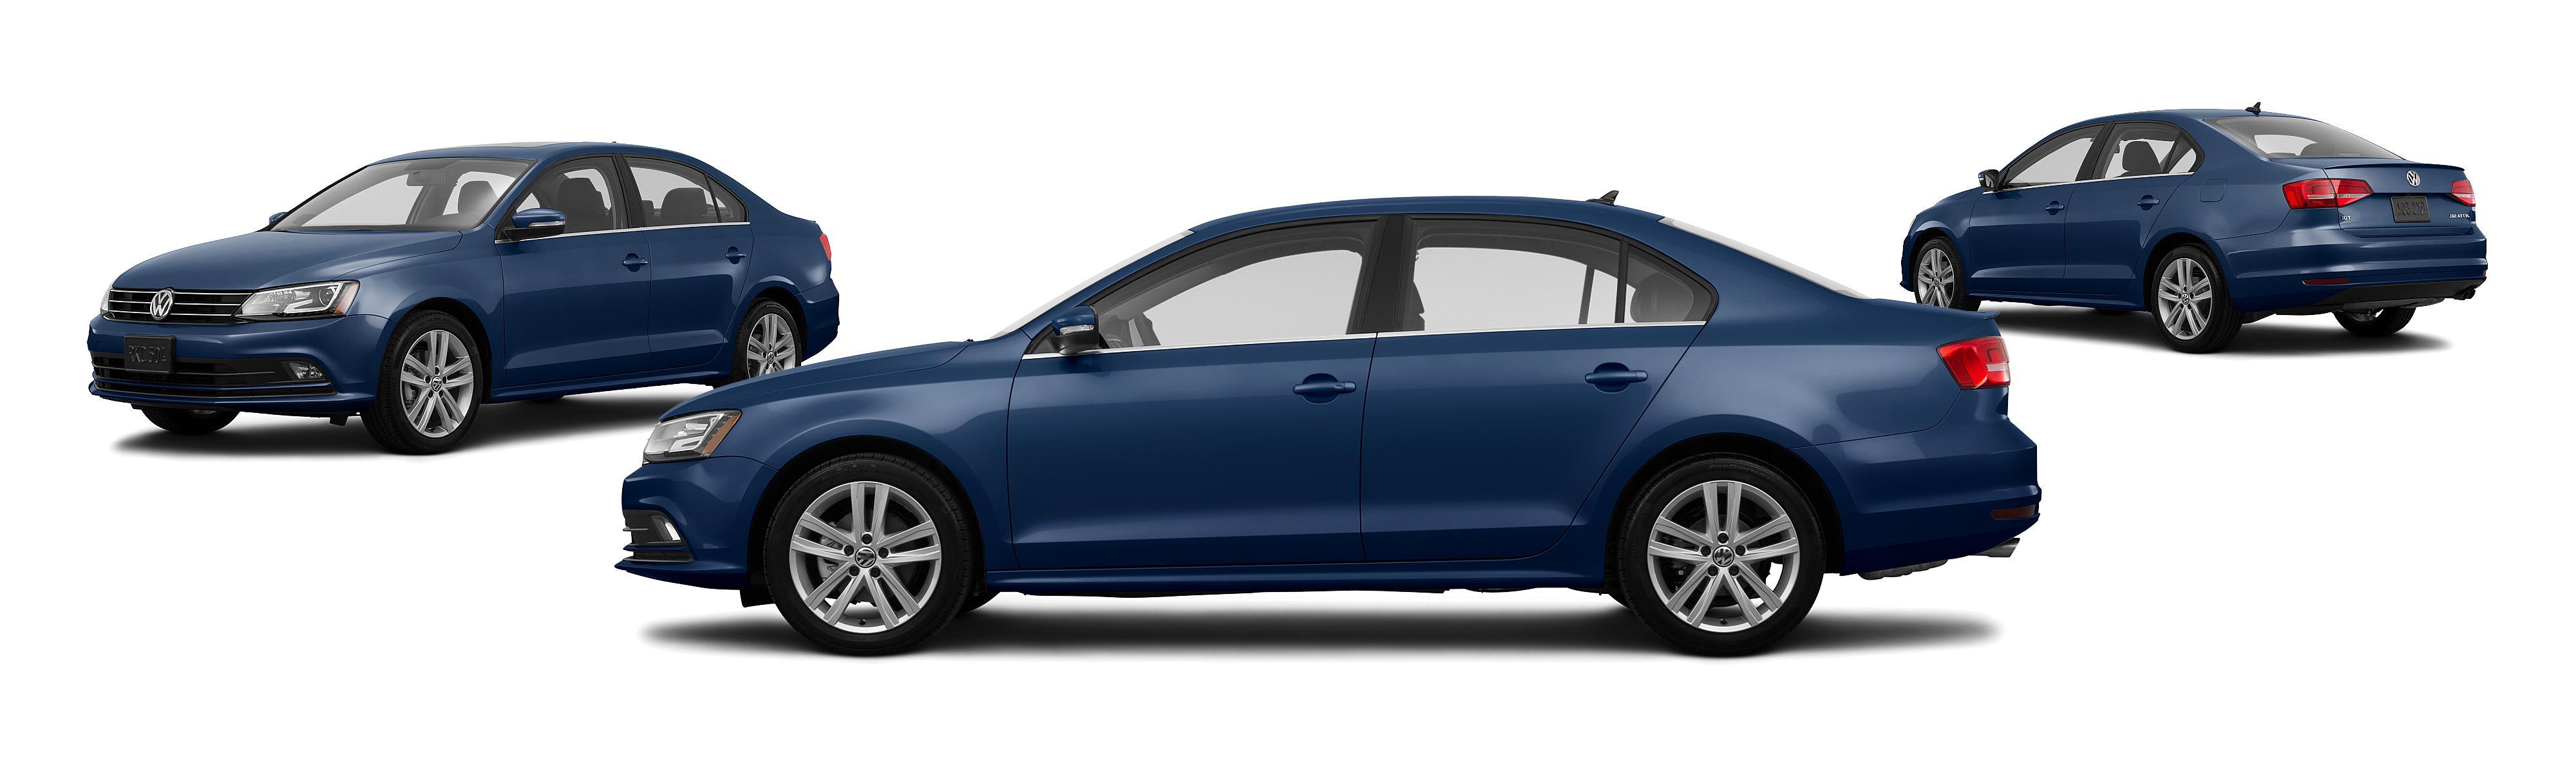 2015 Volkswagen Jetta TDI SEL 4dr Sedan 6A Research GrooveCar